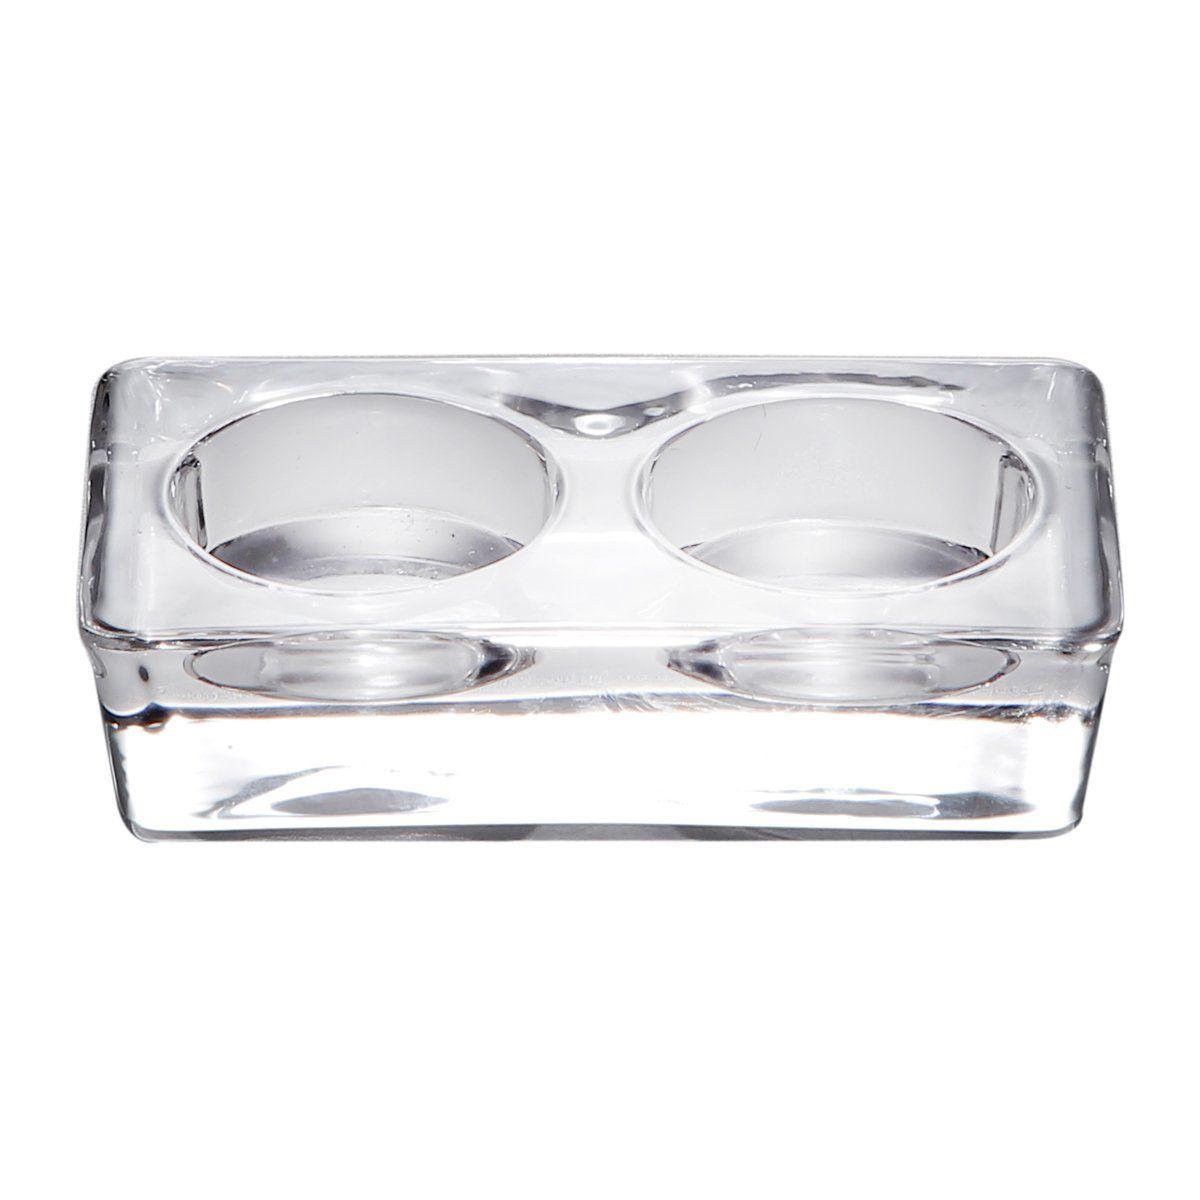 Porta-velas 11 cm para 2 velas de vidro transparente Lara Bon Gourmet – 2346